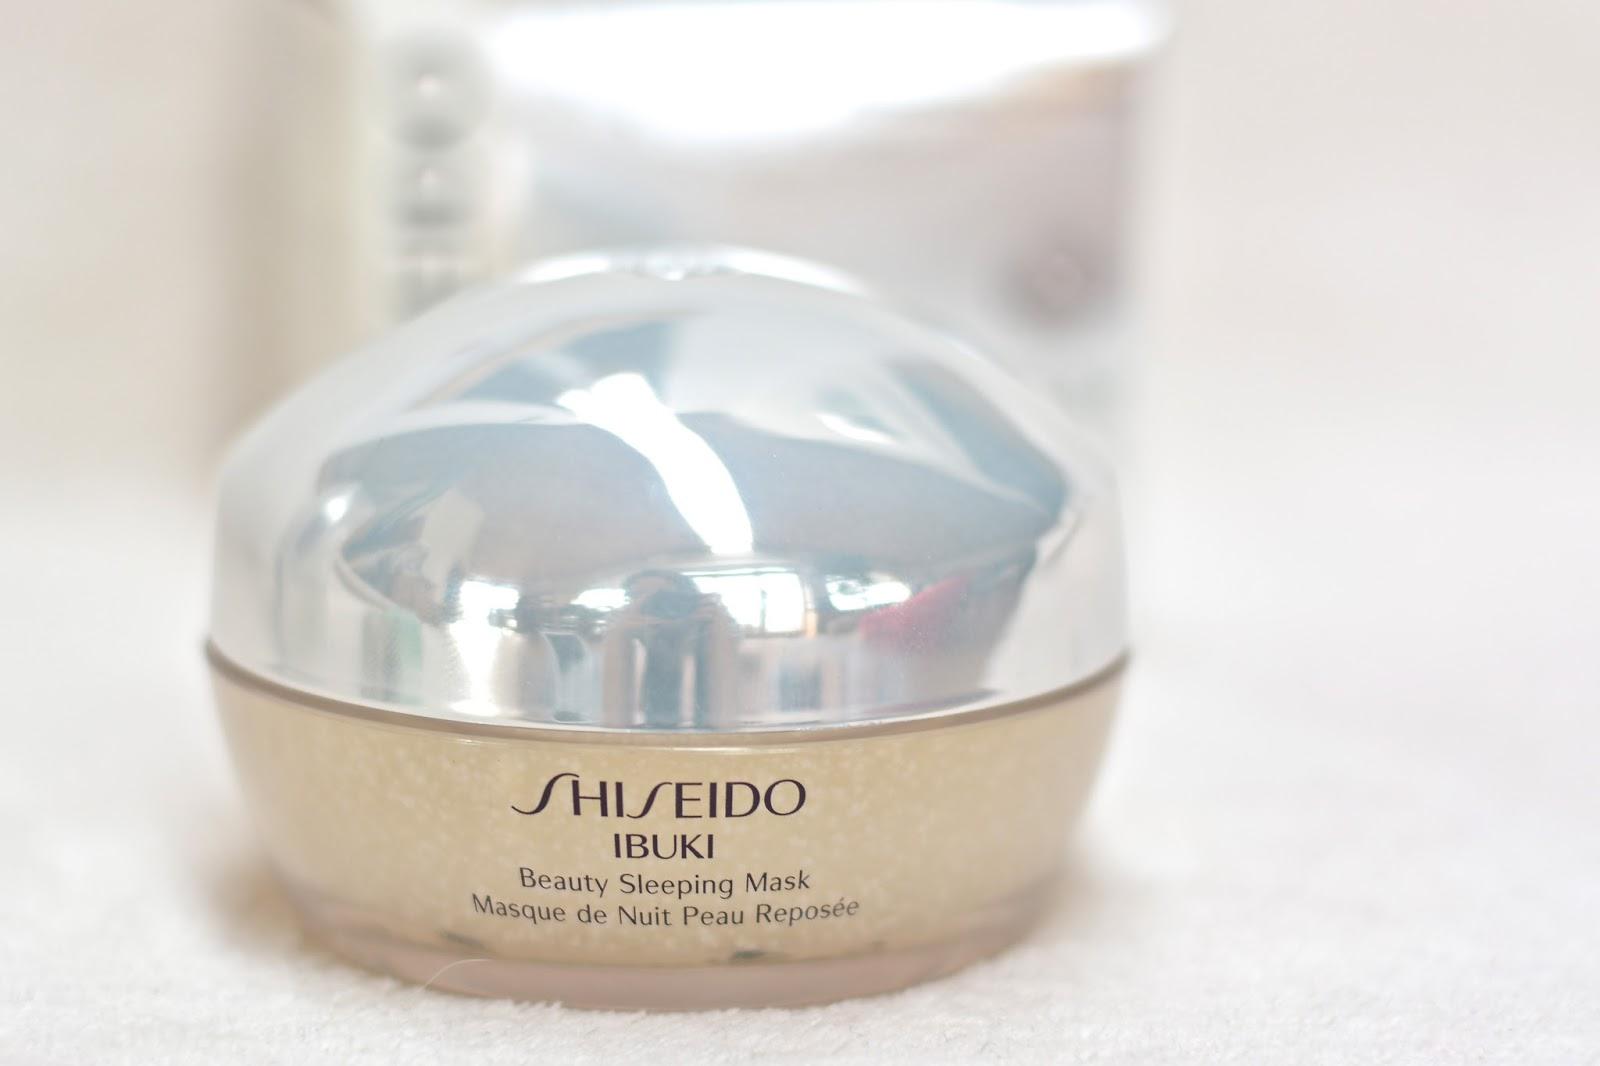 produits pastels pour princesses press es shiseido ibuki. Black Bedroom Furniture Sets. Home Design Ideas